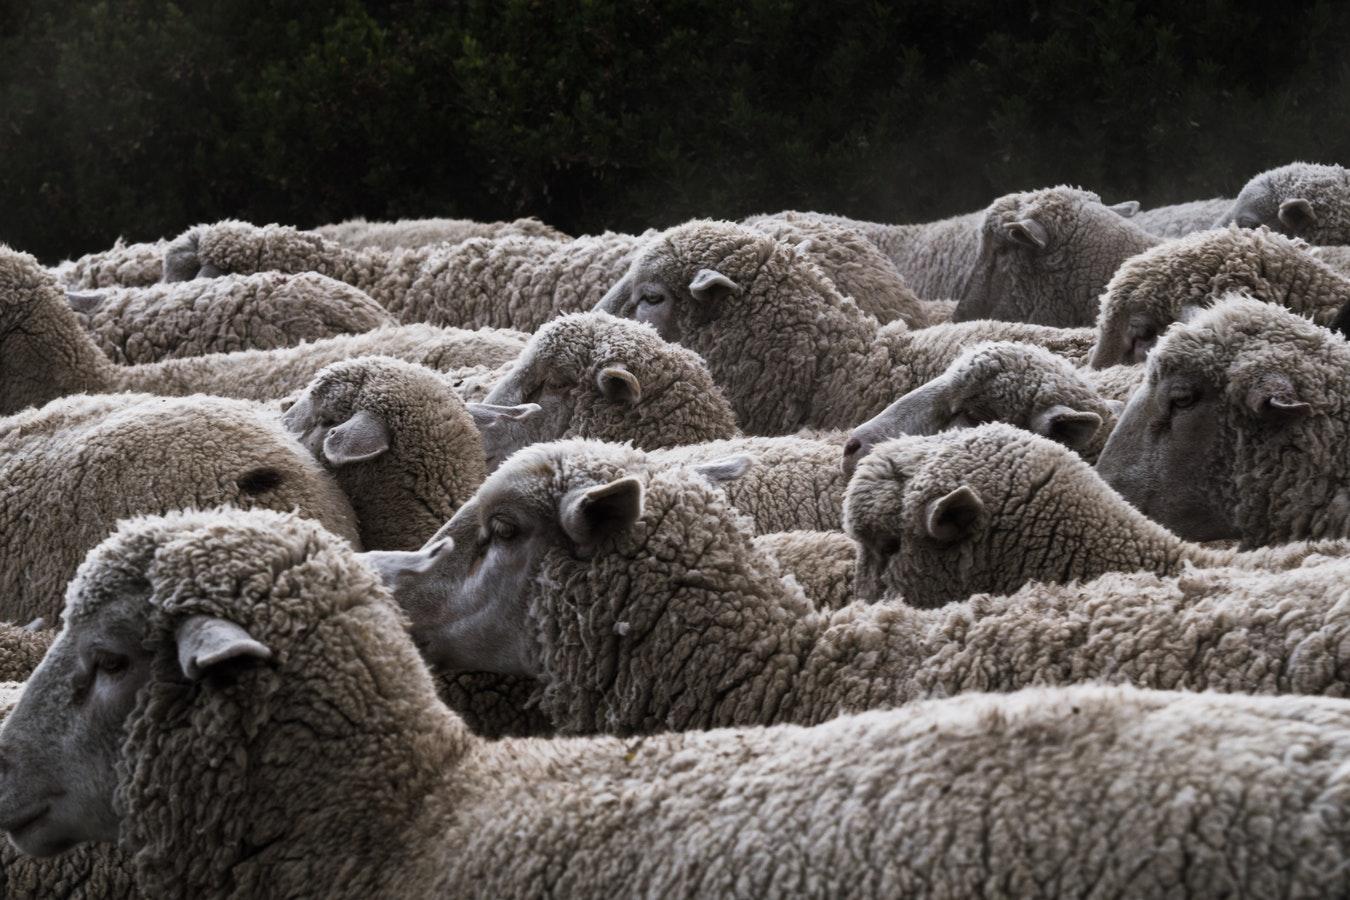 Image of sheep.